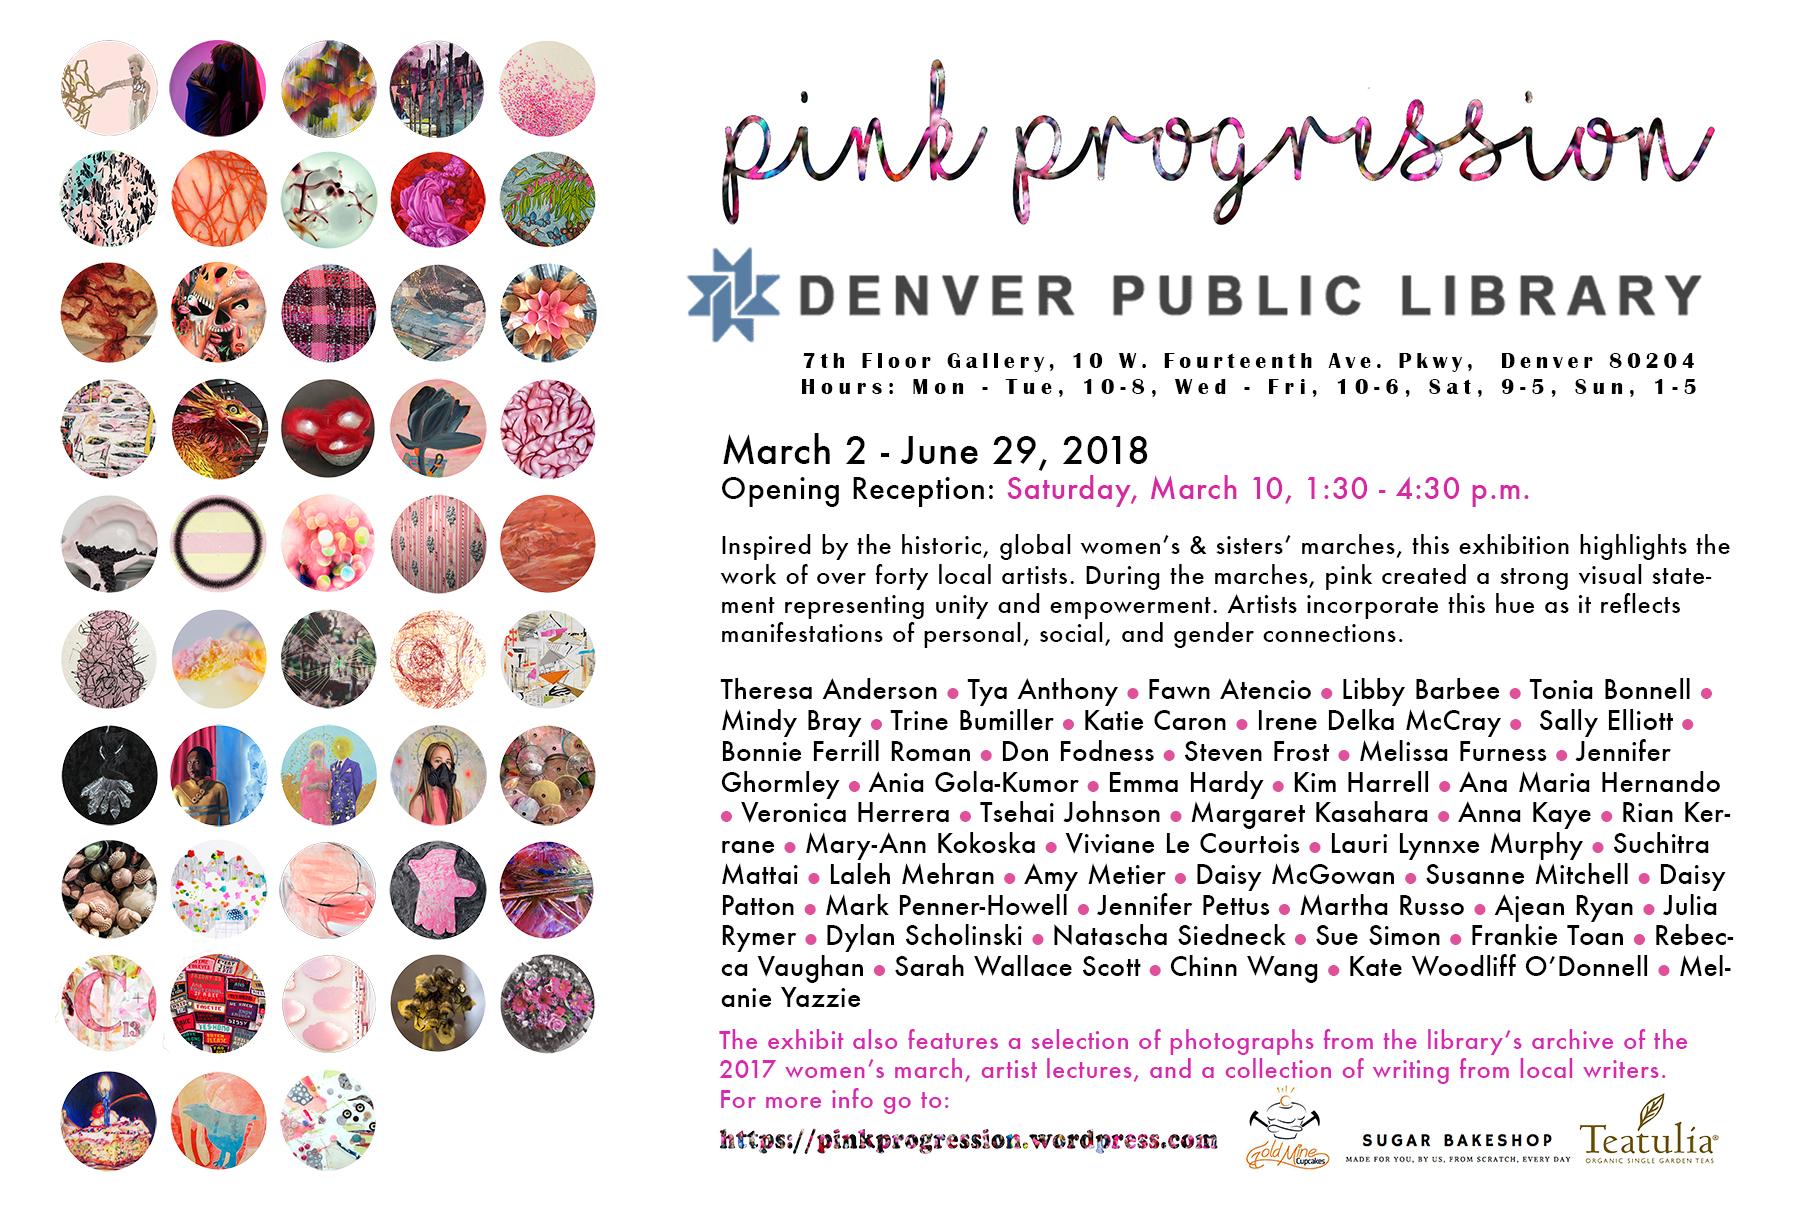 pink-progression-invite-double-sided-dpl.jpg